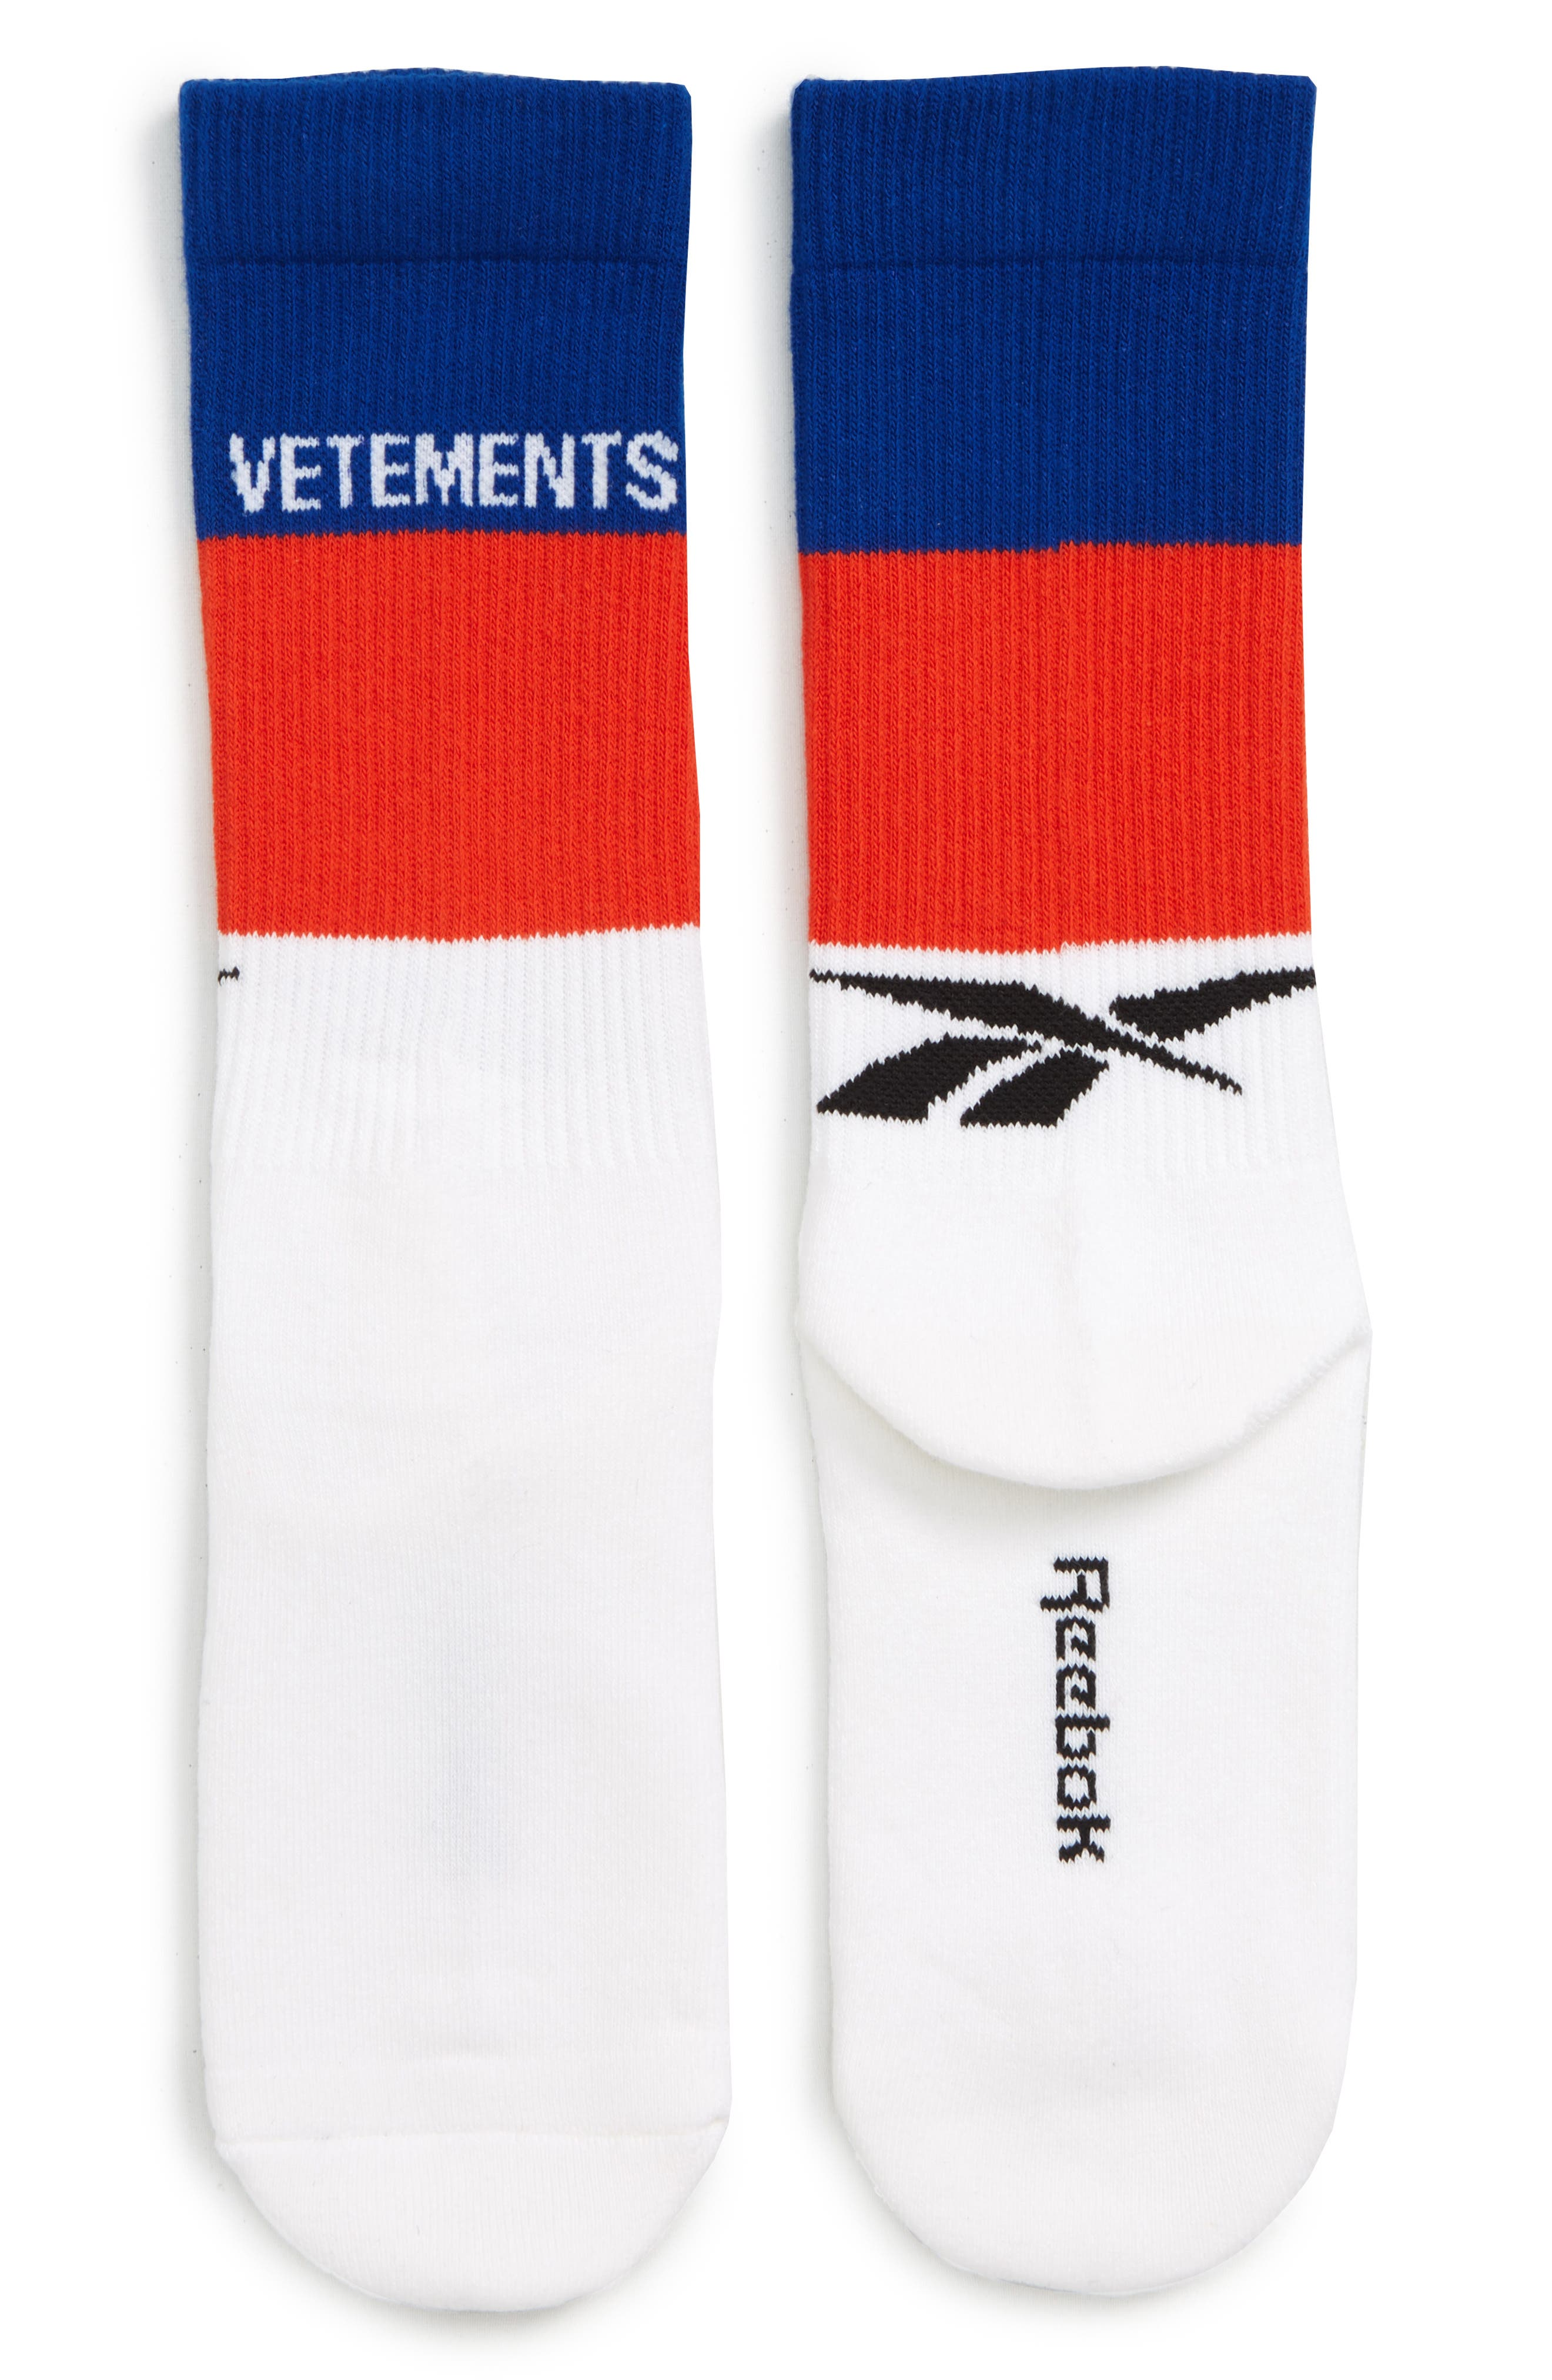 VETEMENTS Stripe Socks, Main, color, BLUE/ WHITE/ RED